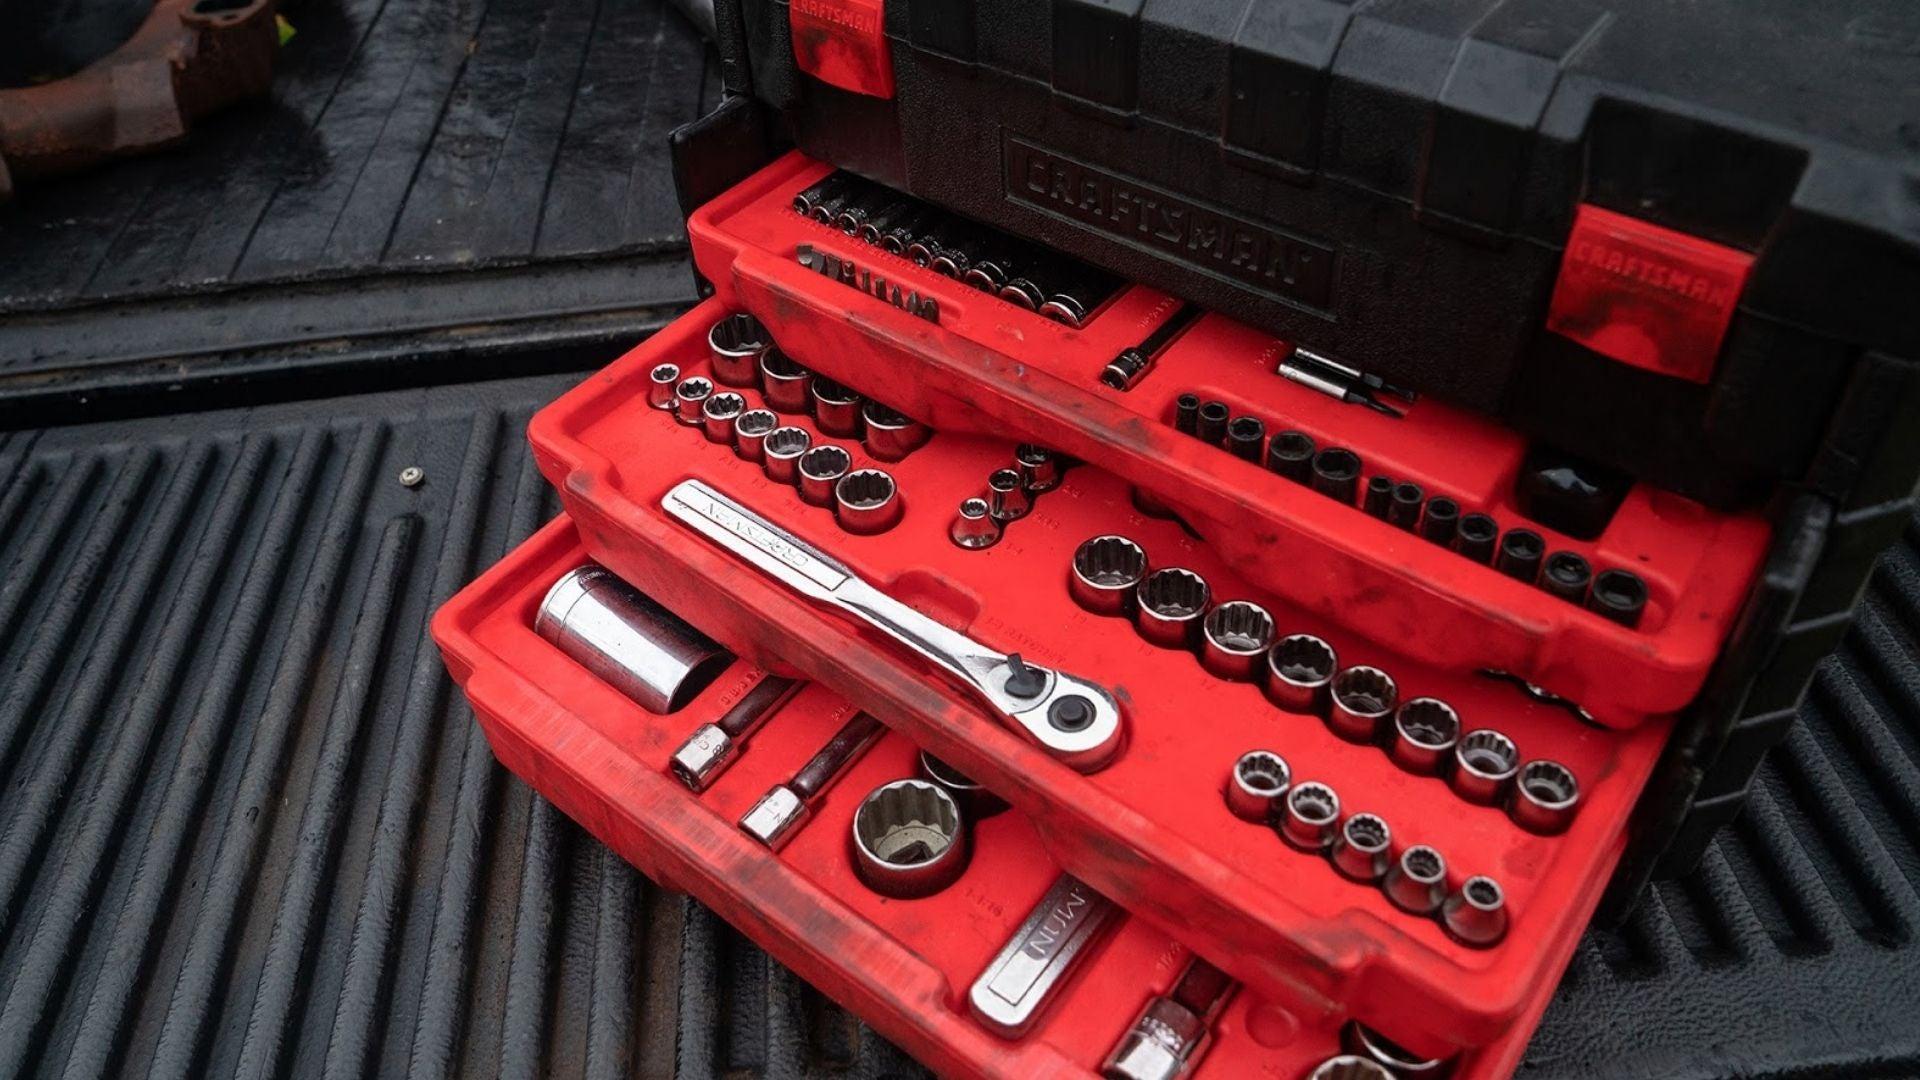 Craftsman 3 Drive Mechanics Tool Box